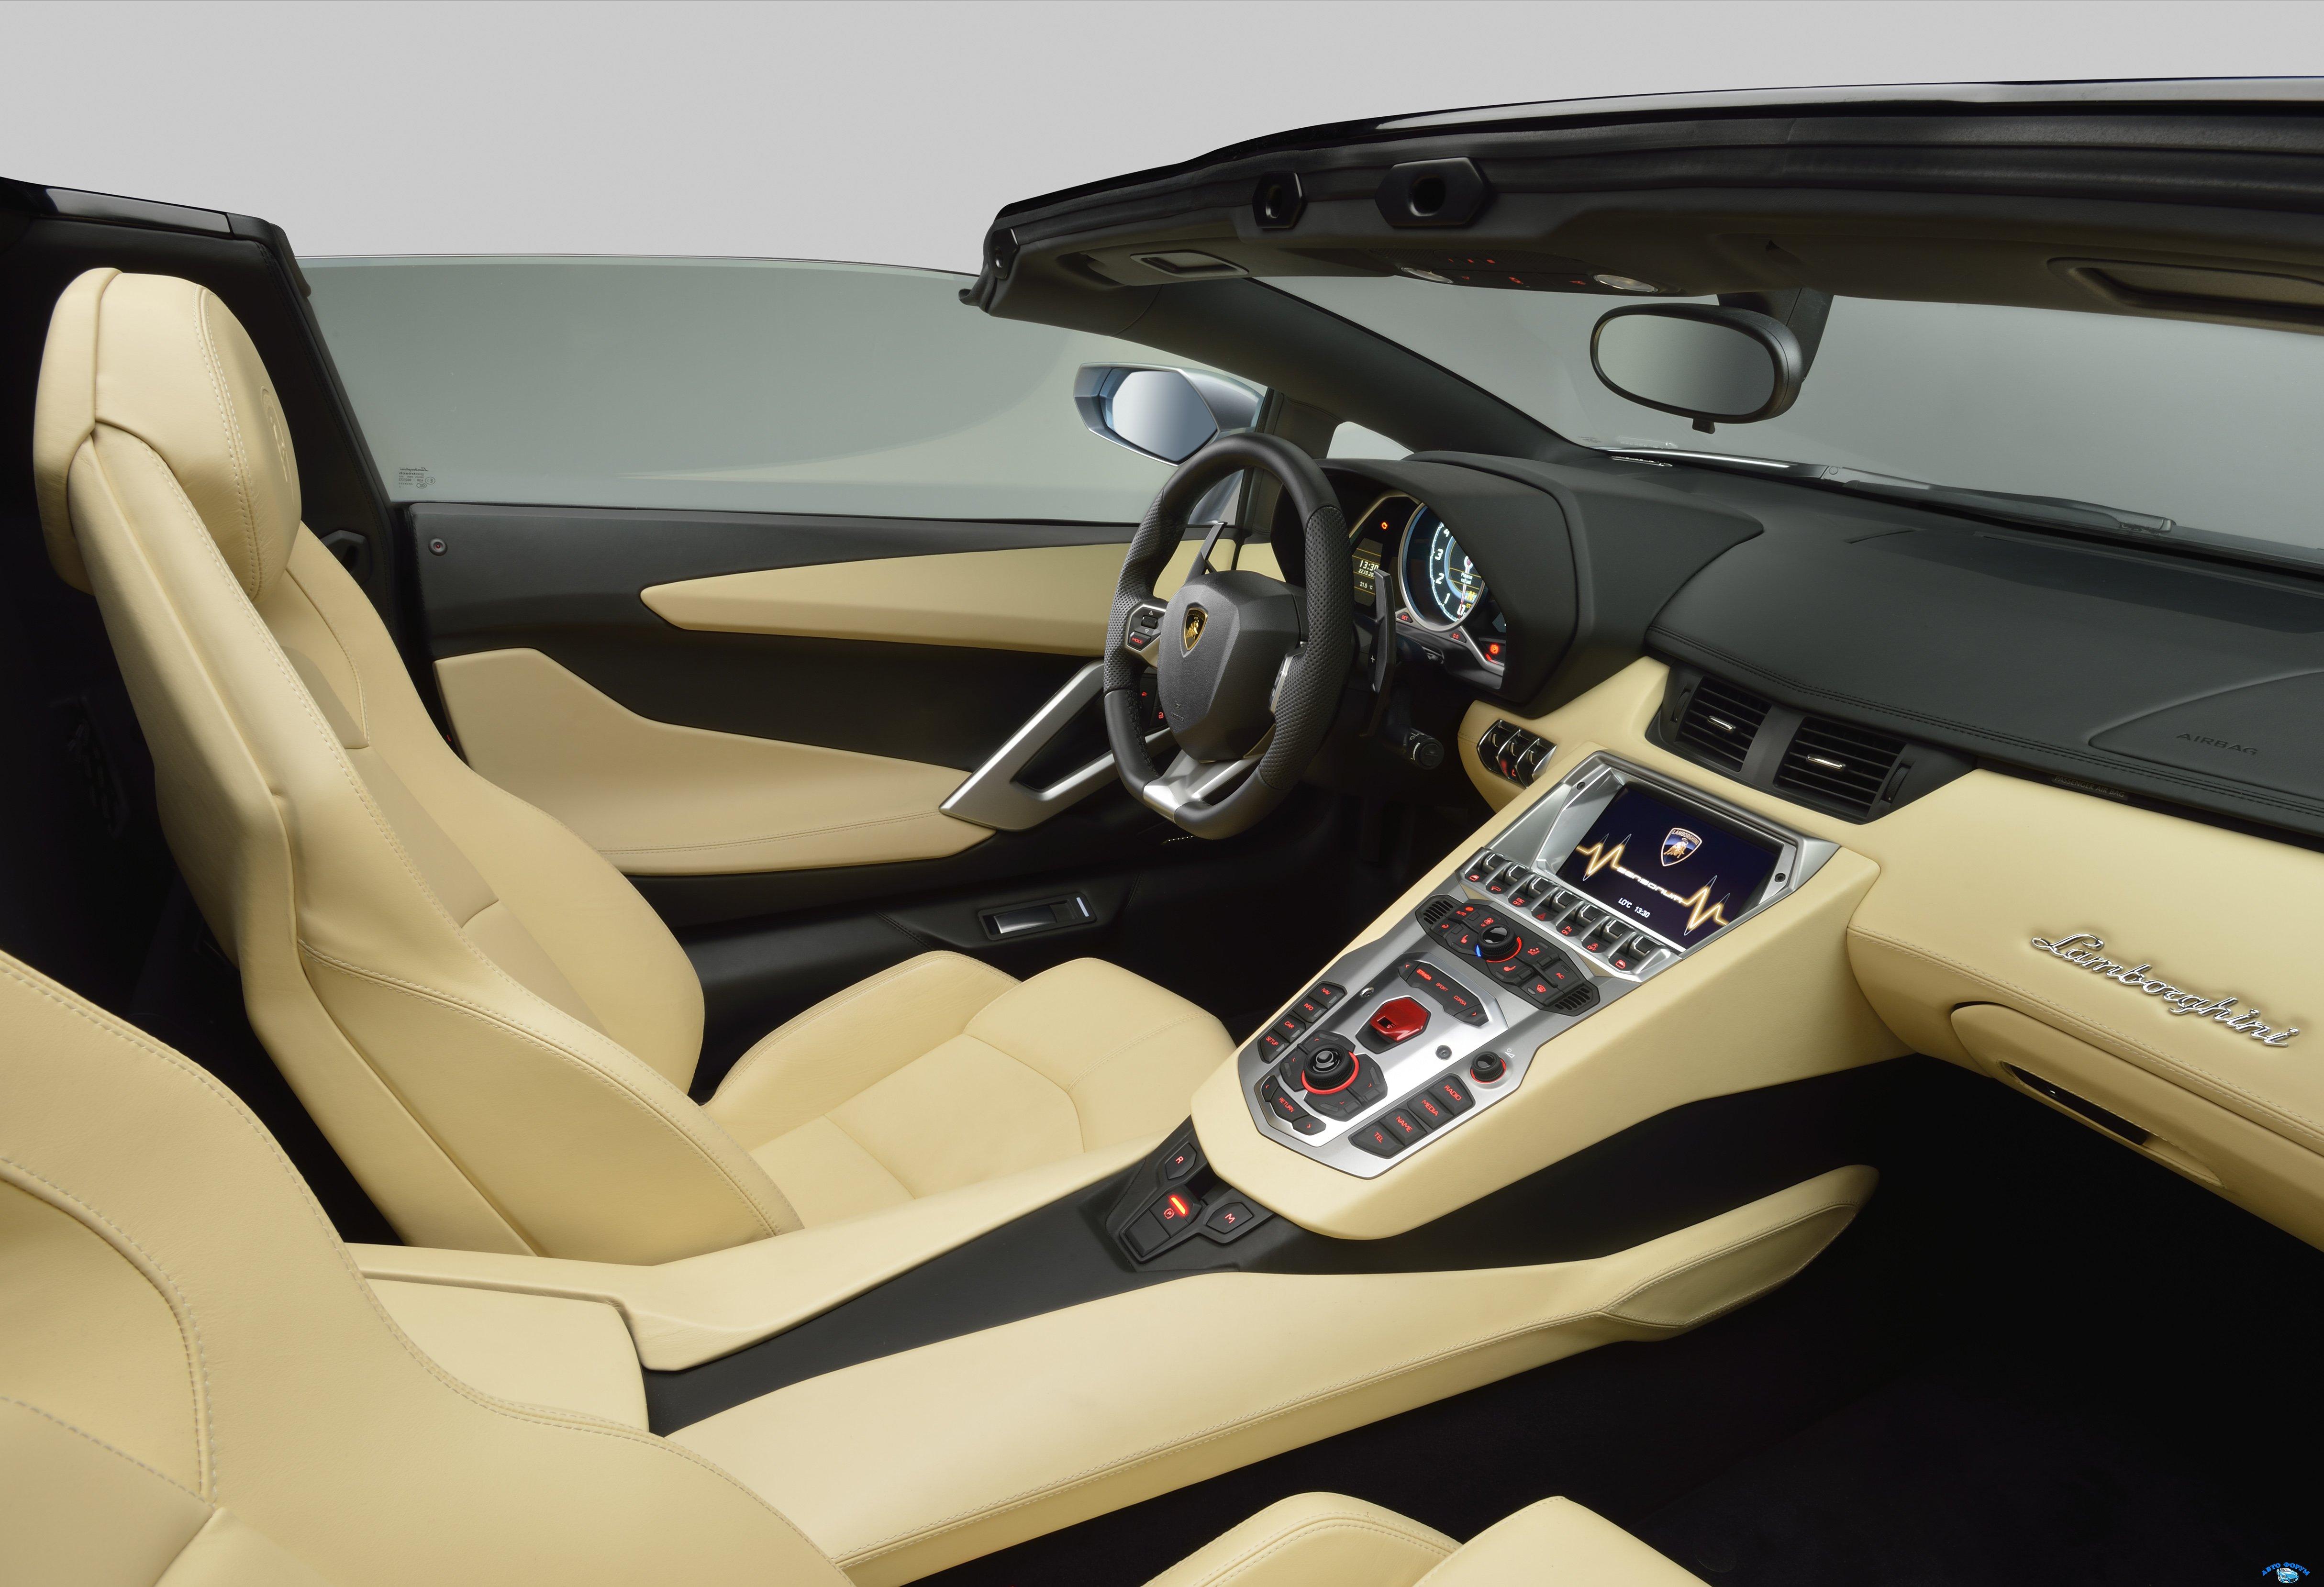 lamborghini_aventador_lp_700-4_roadster_interior_22.jpg